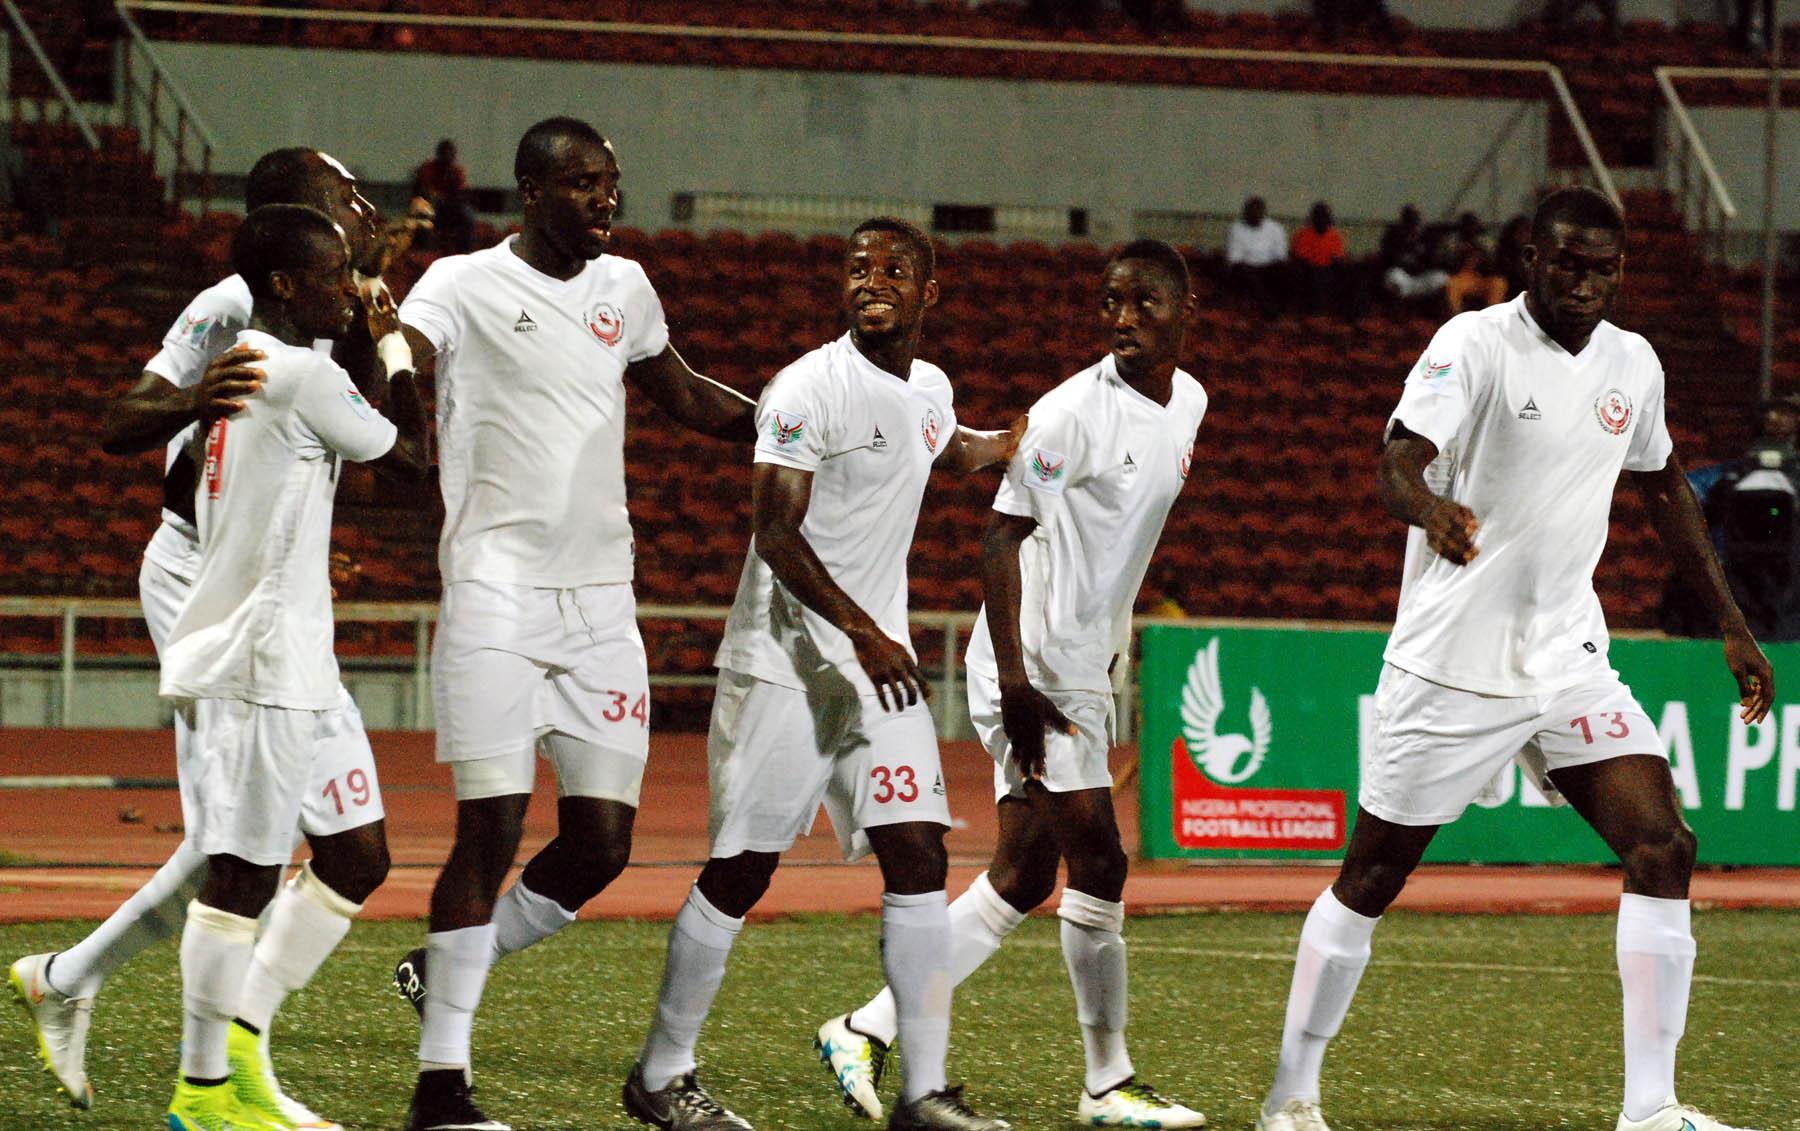 Enugu Rangers Daniel Etoh Fires Warning To NPFL Clubs